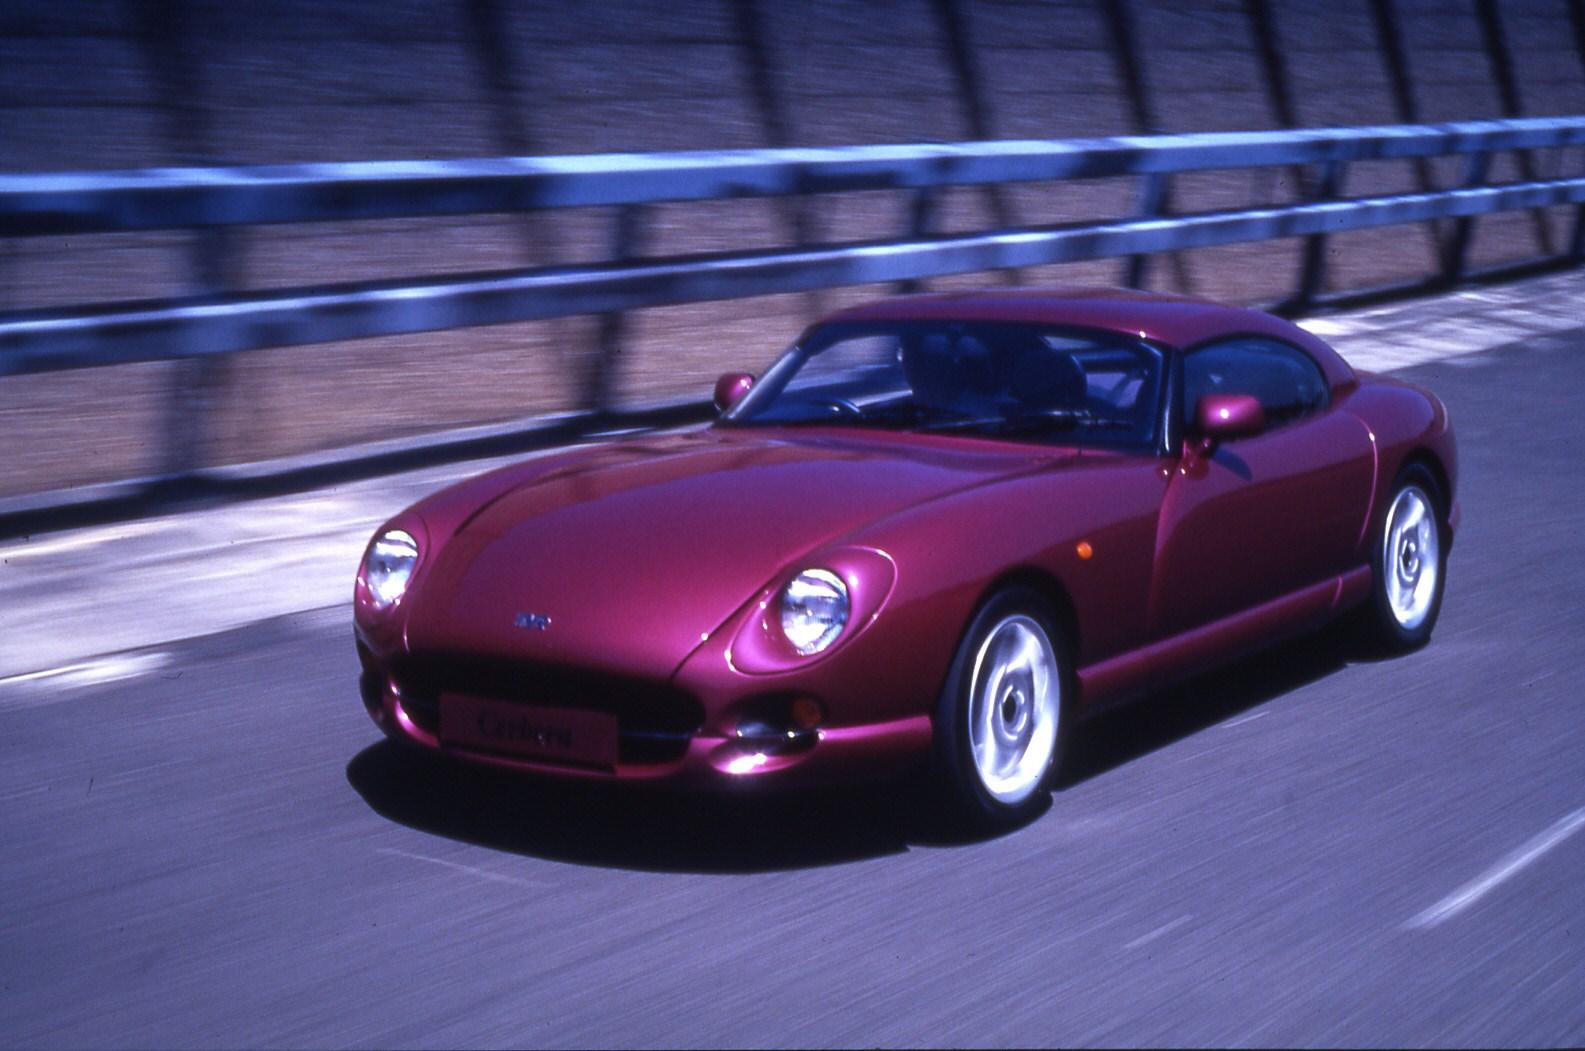 Tvr Cerbera Coupe 1993 2007 Photos Parkers